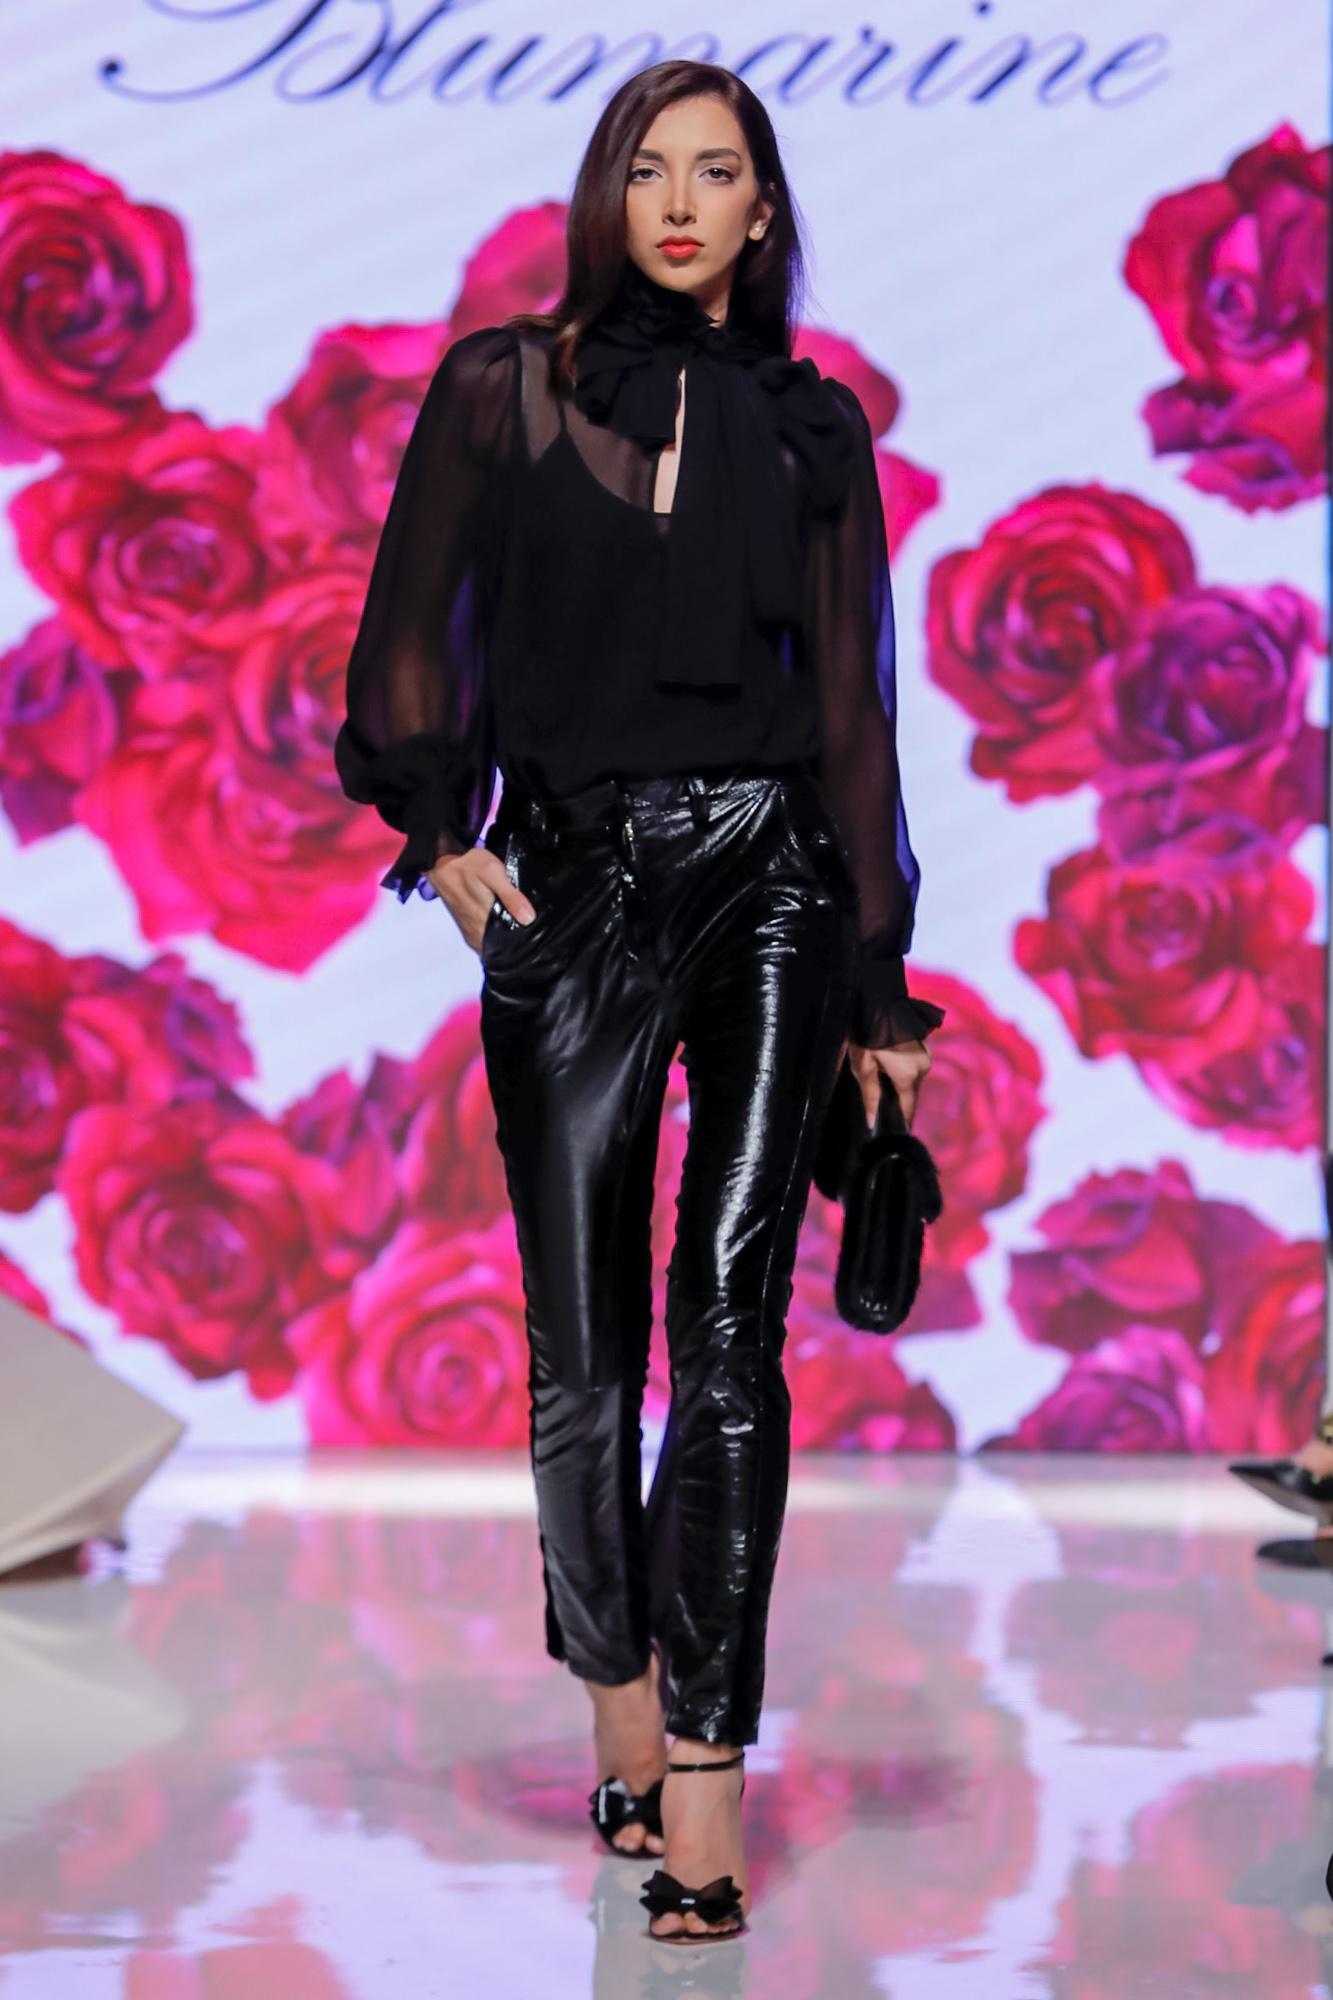 Blumarine Resort 2020 Collection Arab Fashion Week